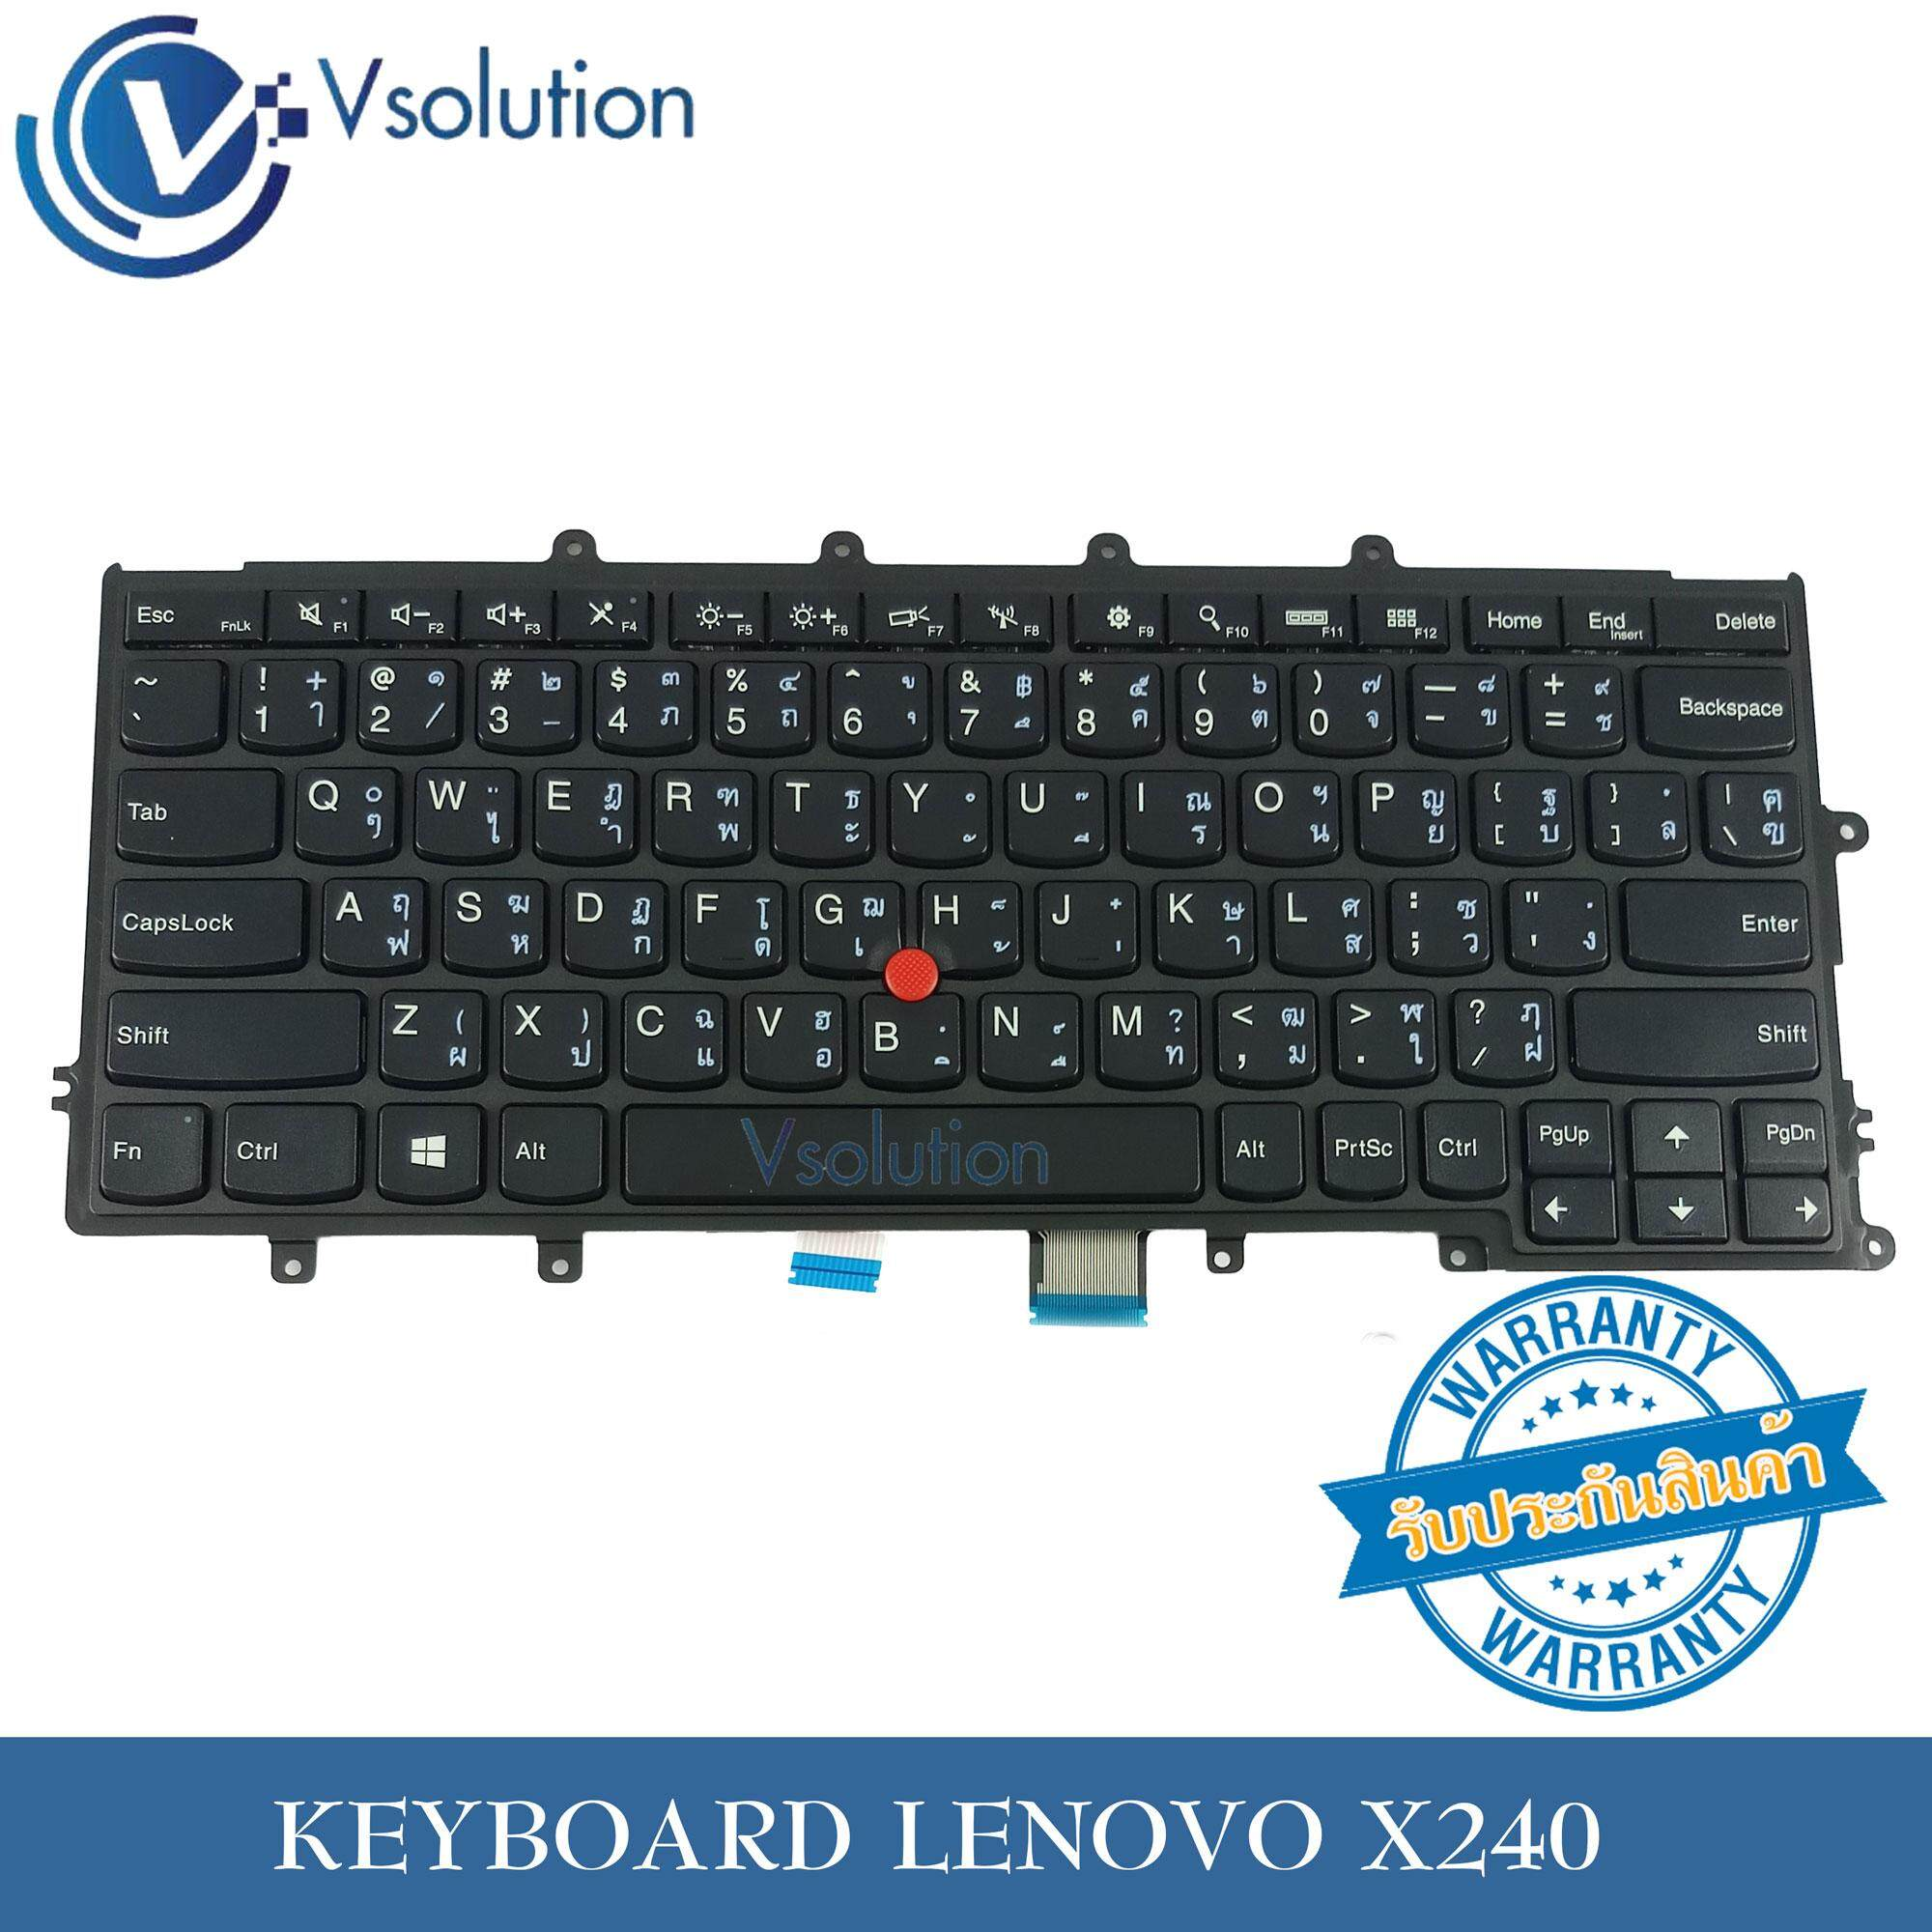 Driver UPDATE: Lenovo IdeaPad S500 USB Keyboard